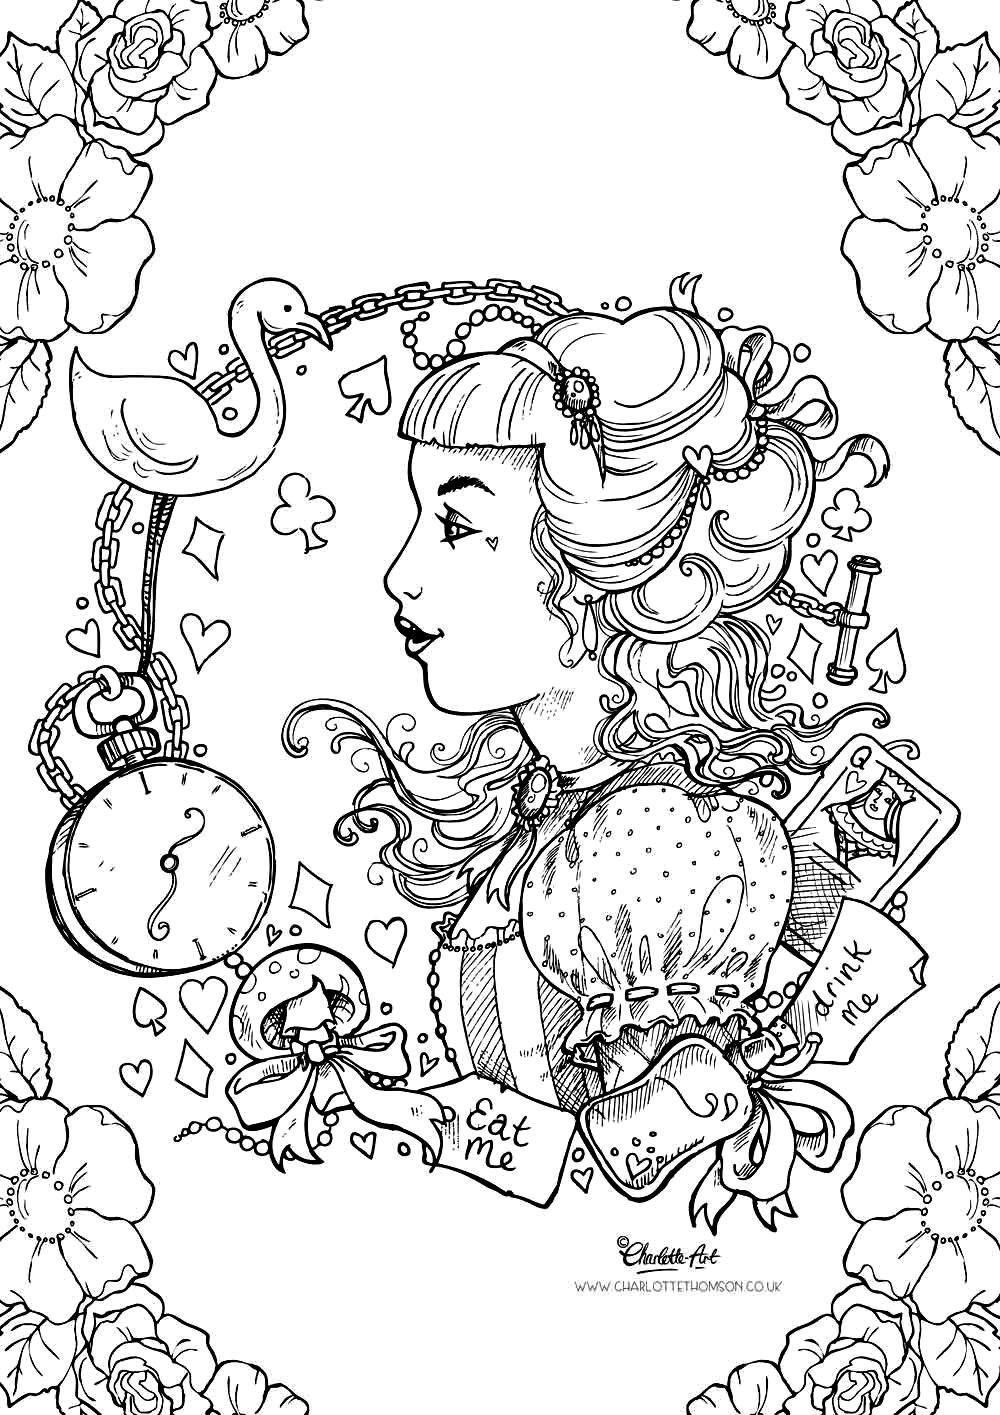 Charlotte Thomson Art - Alice in Wonderland Gothic Lolita Kawaii ...